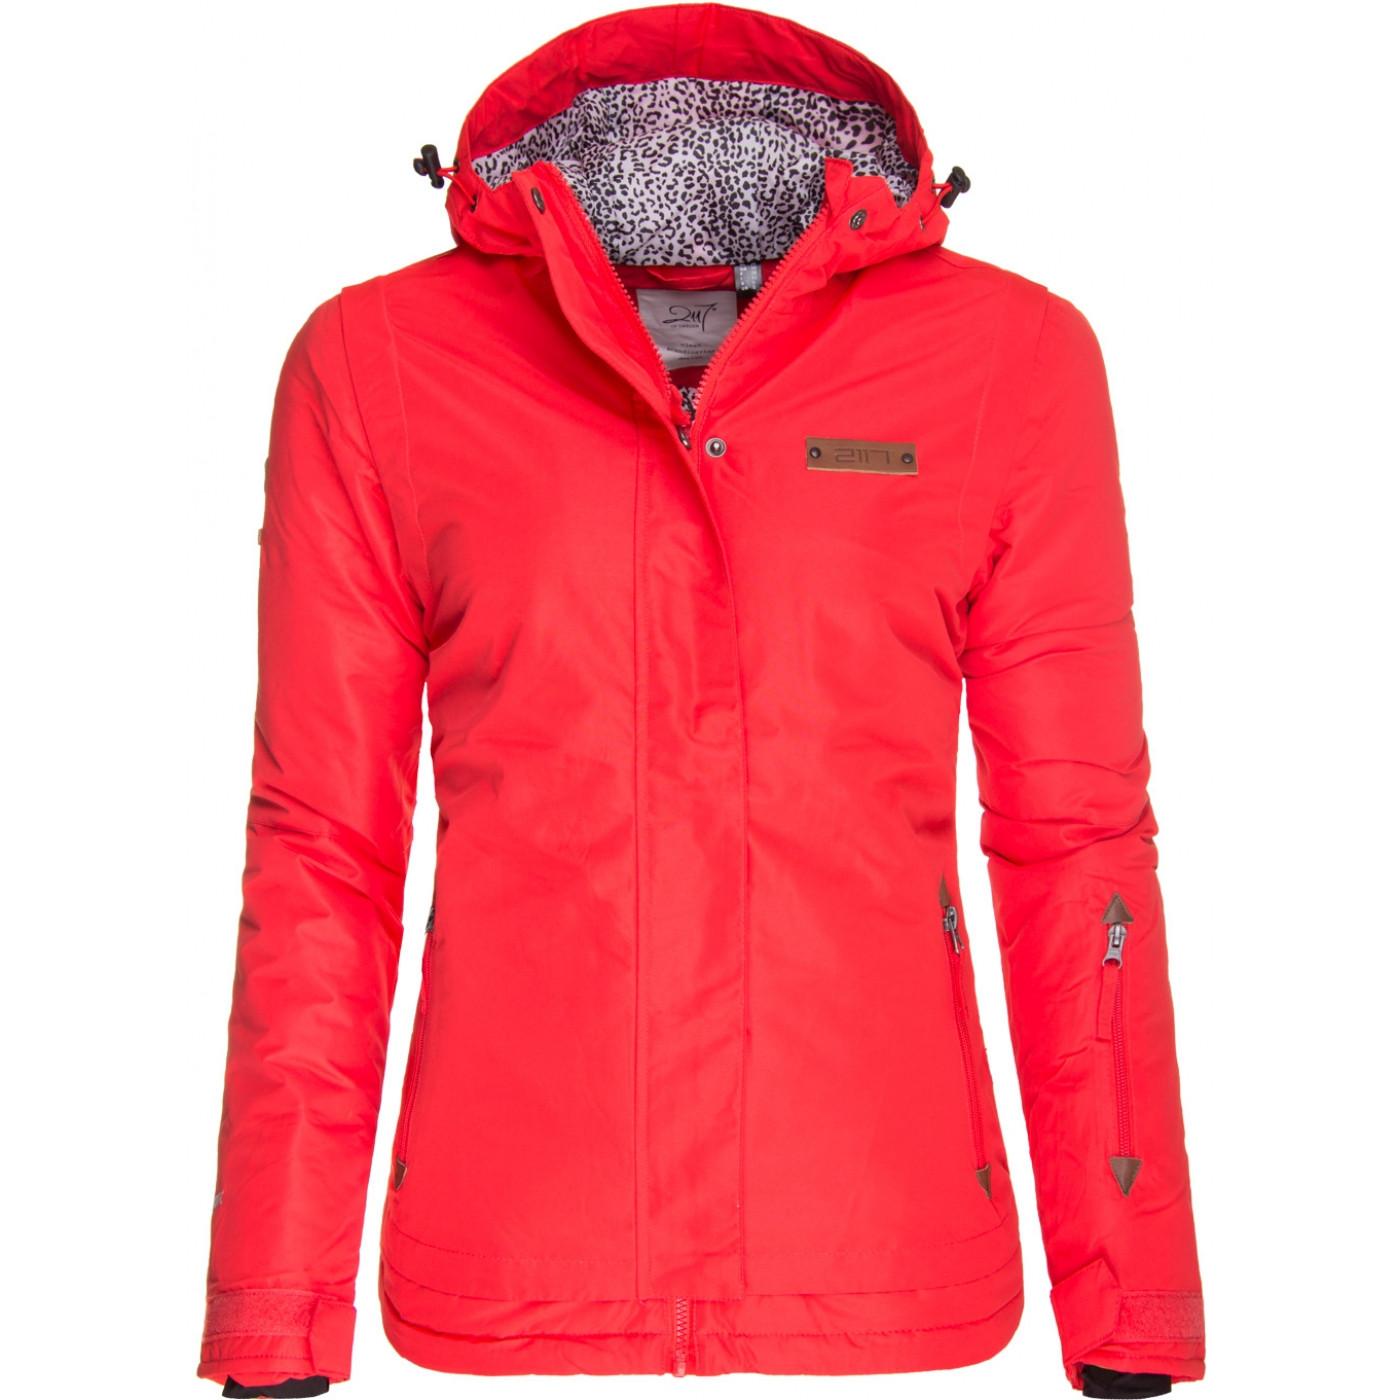 a8fac2845a Predaj skončil - Winter jacket for women 2117 SWEDEN SIRGES. Dámska zimná  bunda ...